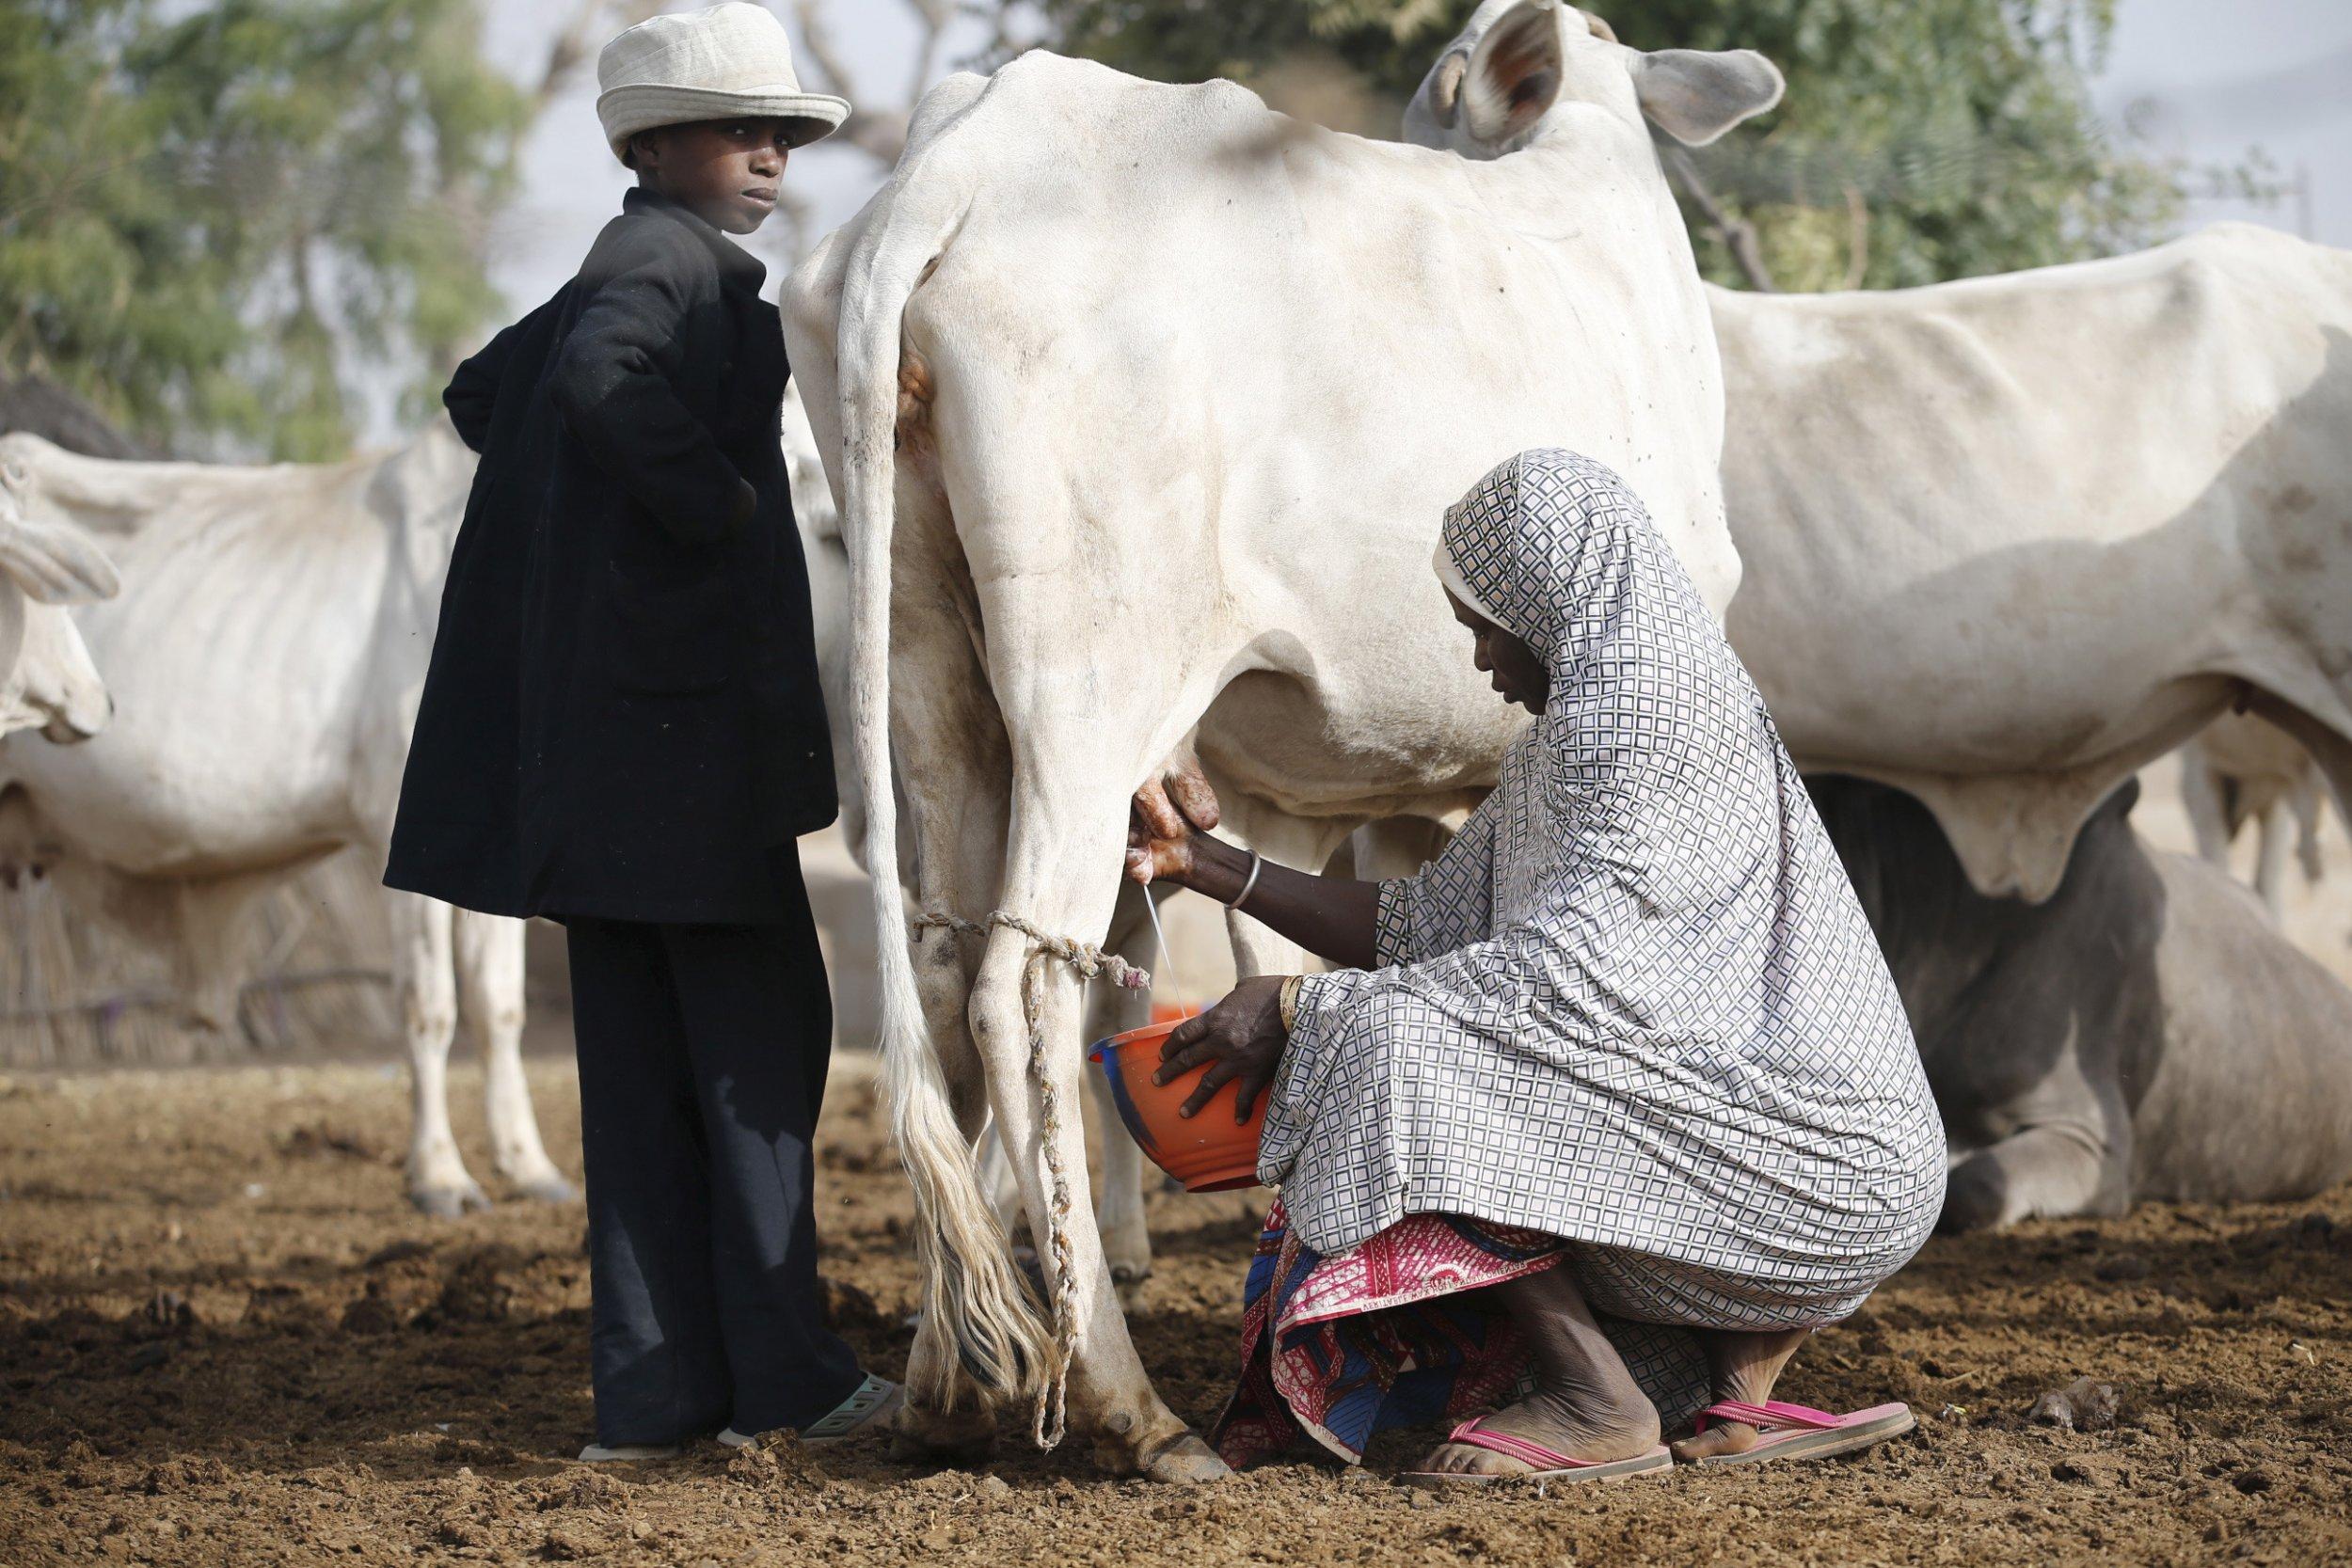 Fulani herdswoman milks cow.